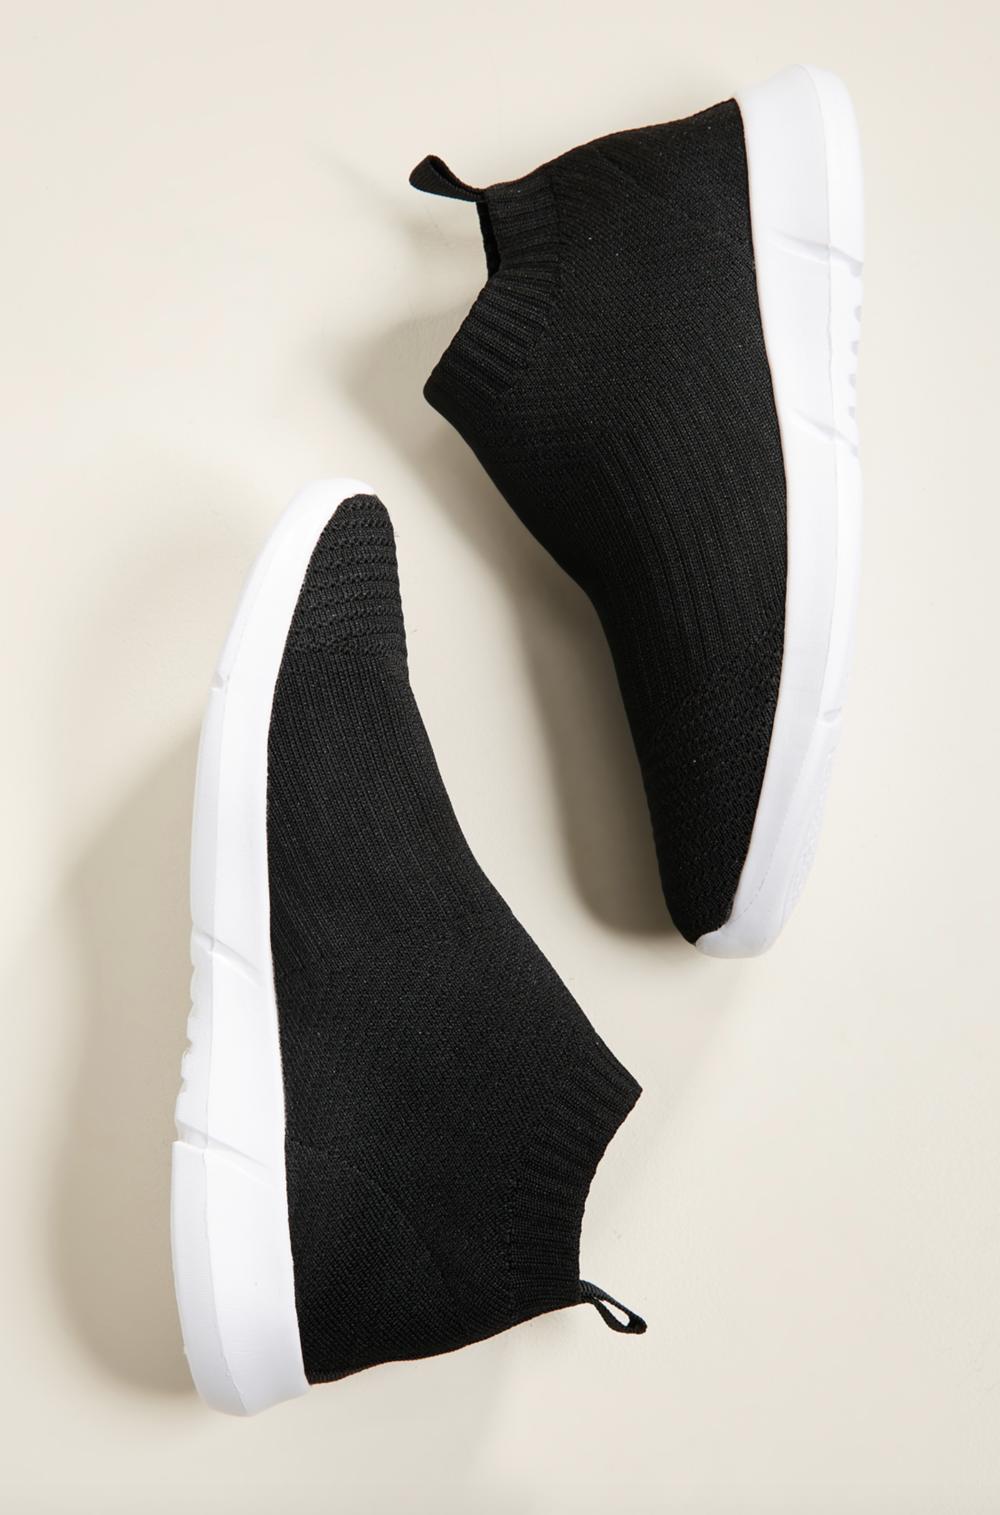 Steven Fabs Knit Joggers sneakers